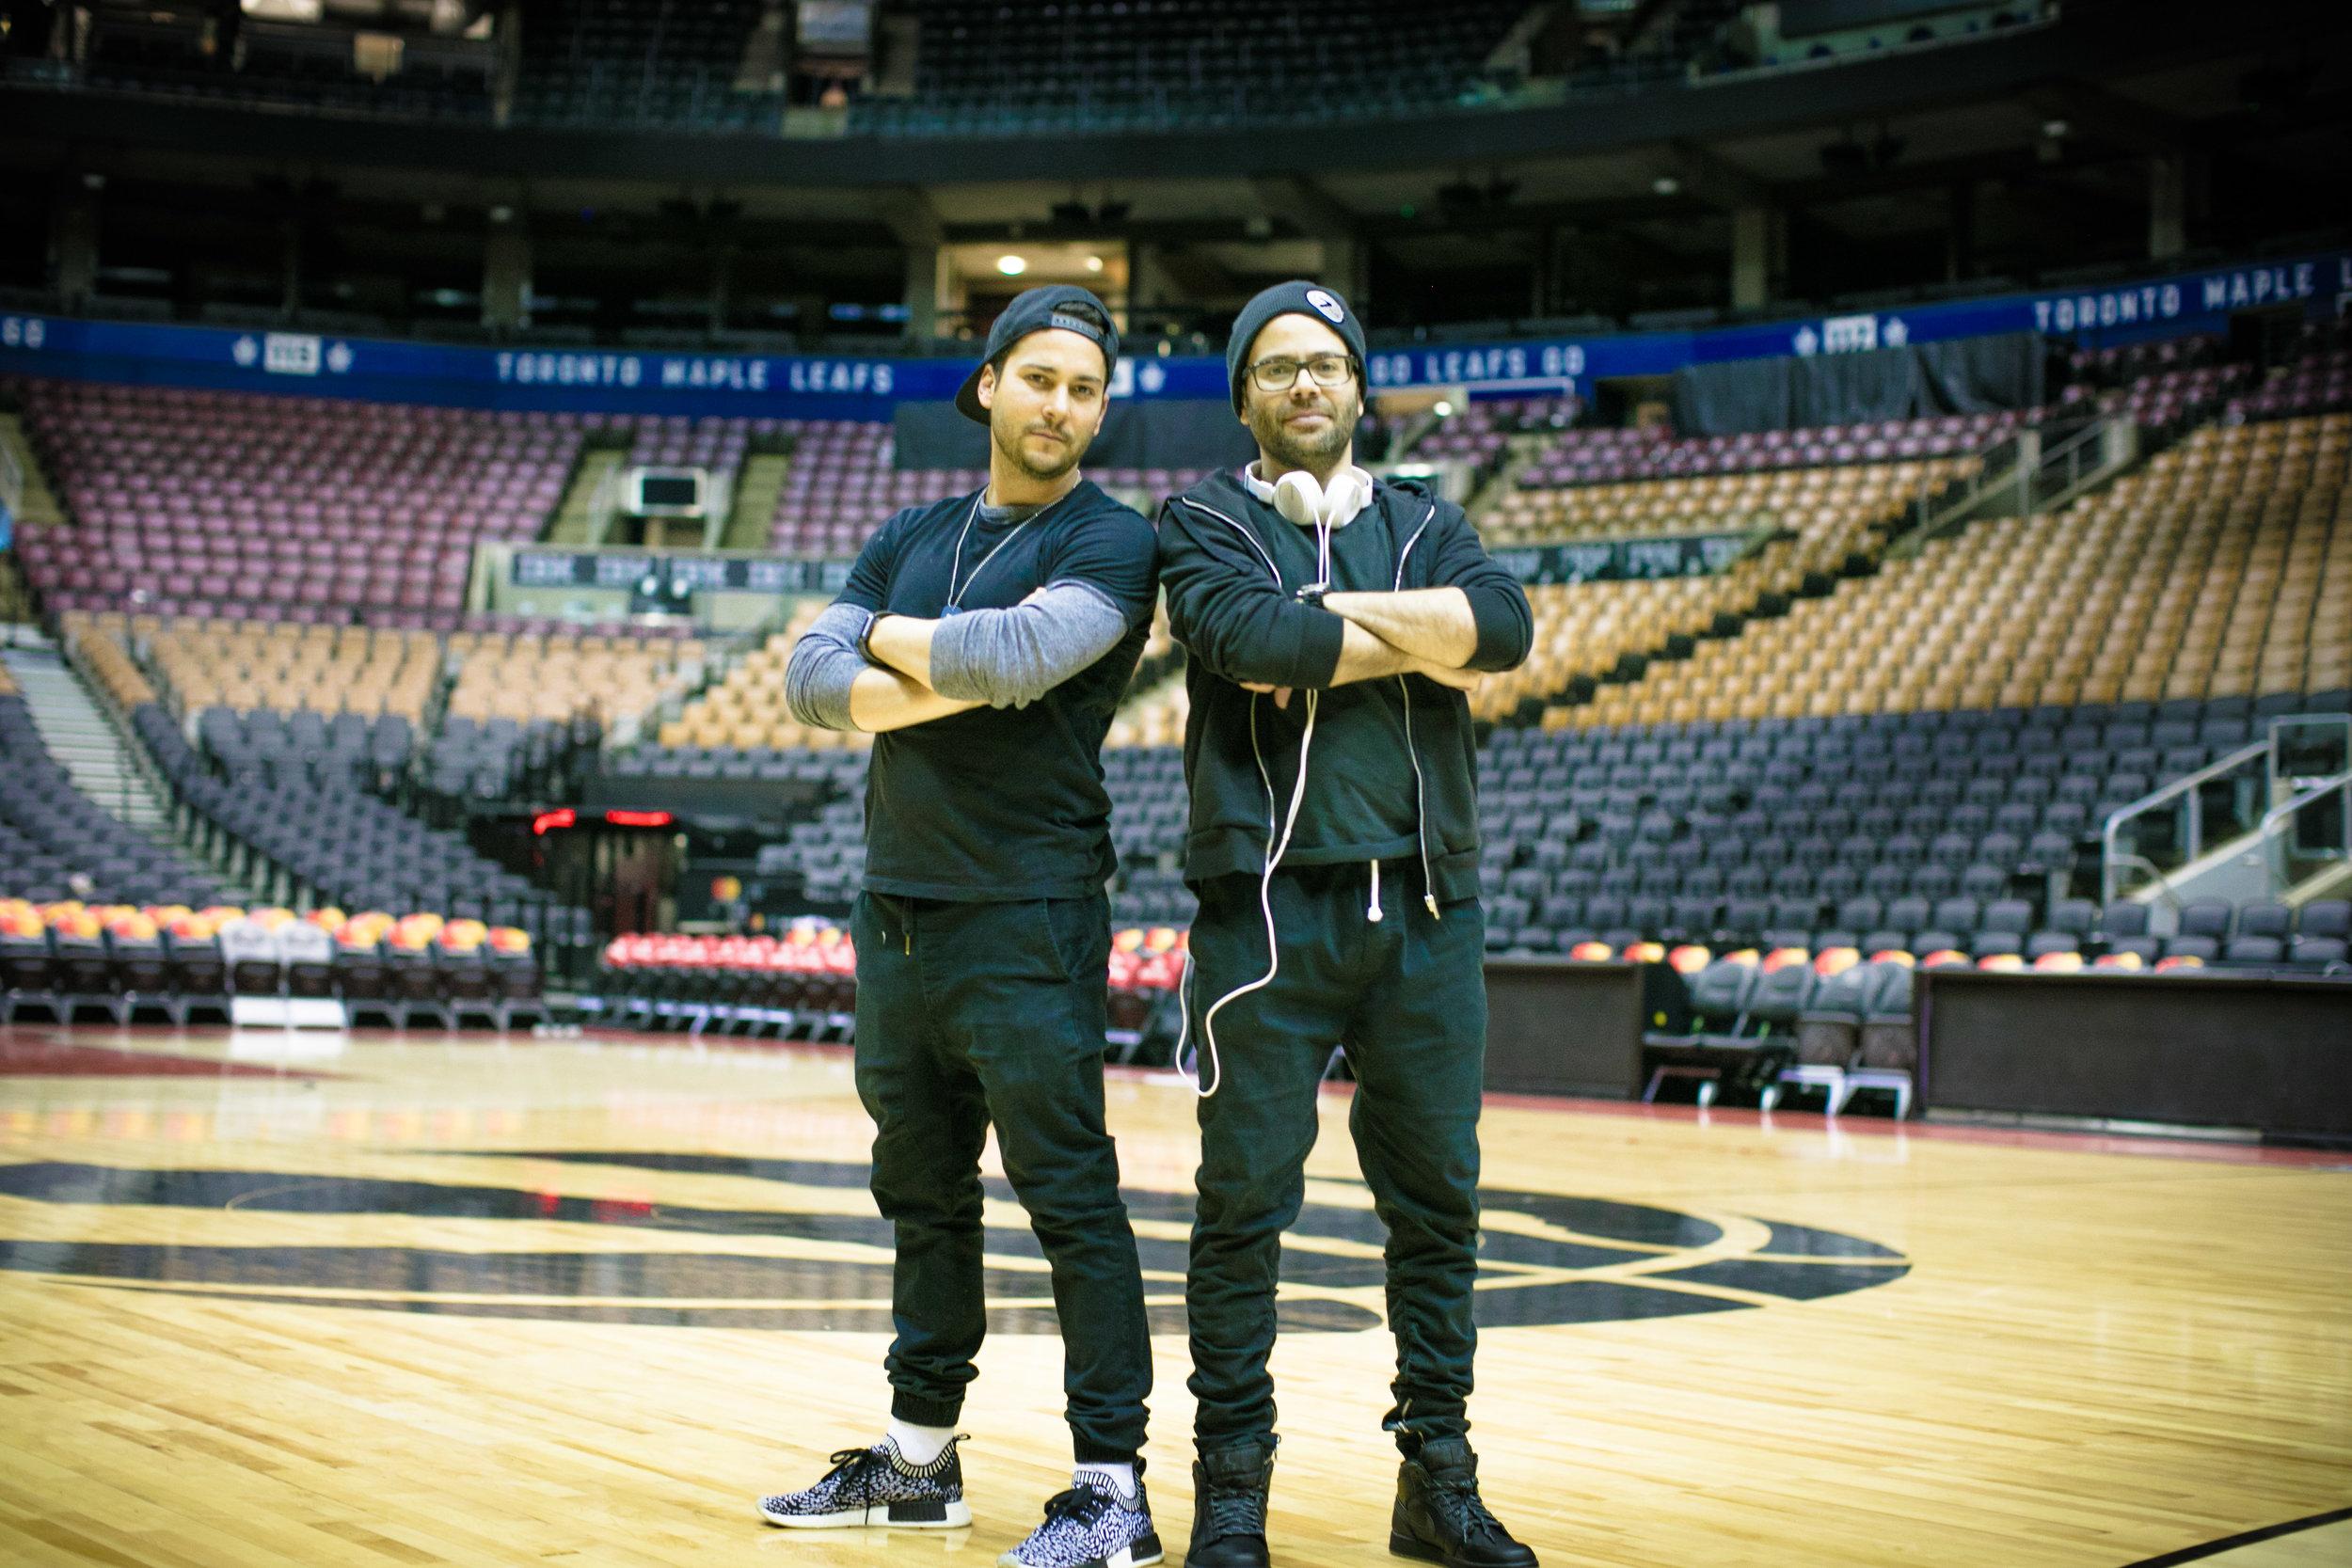 Thrillusionists BTS - Day 3 - Air Canada Centre-14.jpg